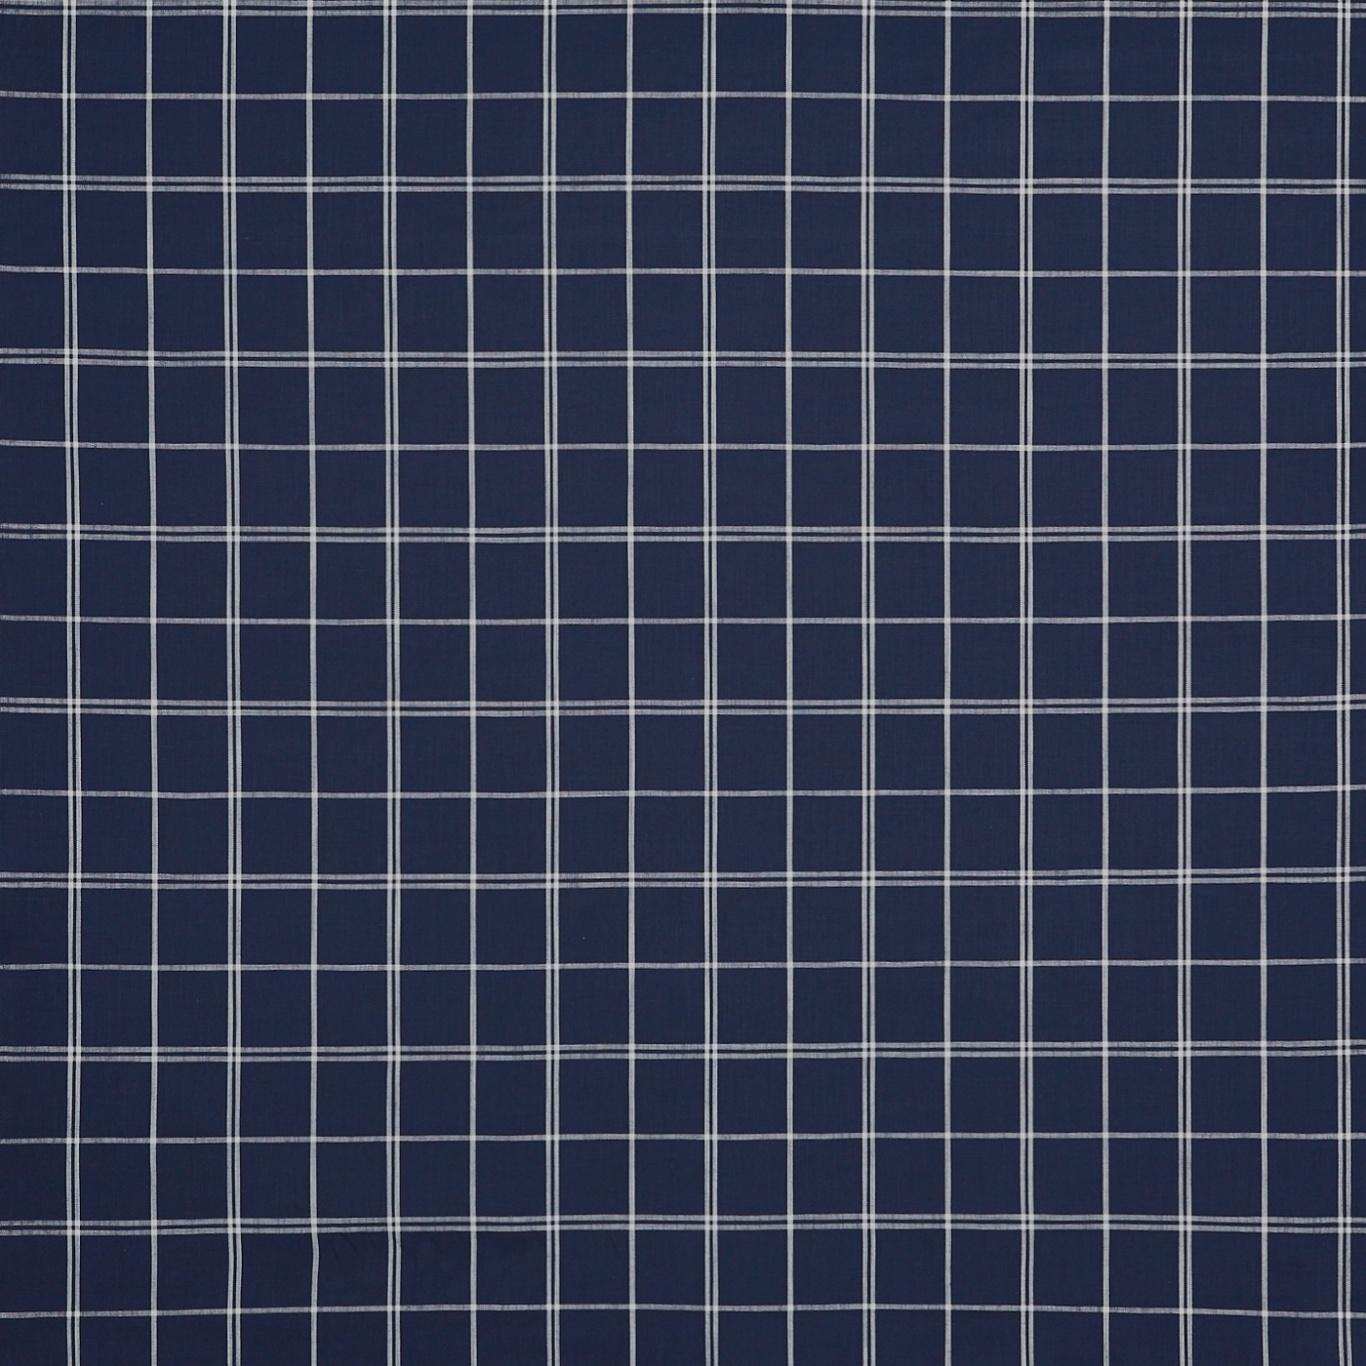 Image of Prestigious Boston Navy Fabric 3814/706